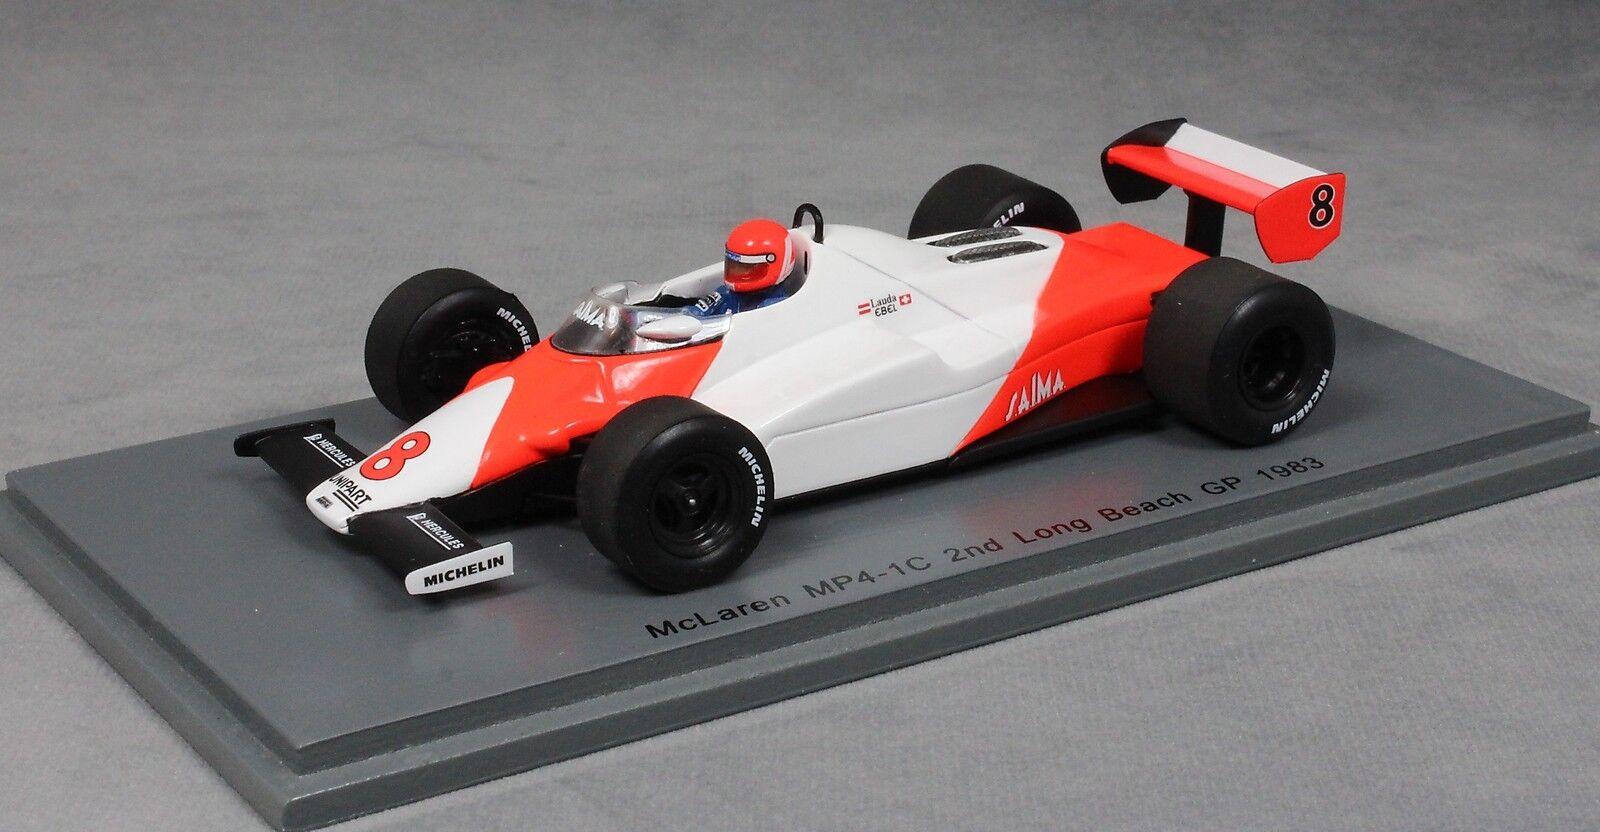 Spark McLaren MP4/1C 2nd LONG BEACH GRAND GRAND GRAND PRIX 1983 Niki Lauda S4842 1/43 NEUF   Merveilleux  584545